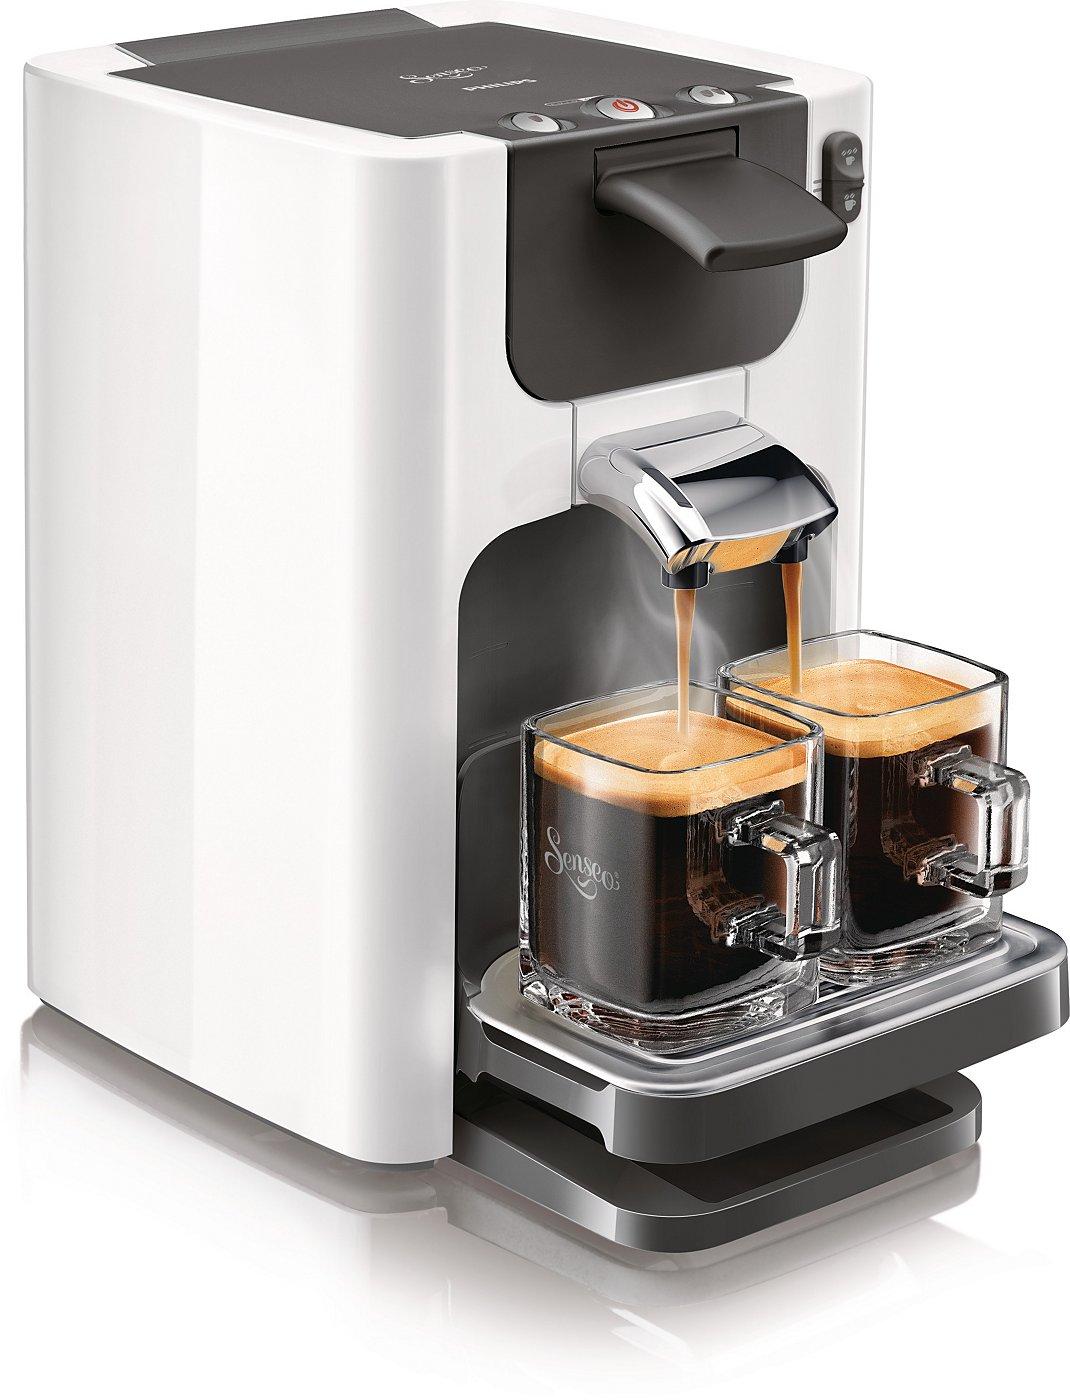 cafetiere senseo cdiscount